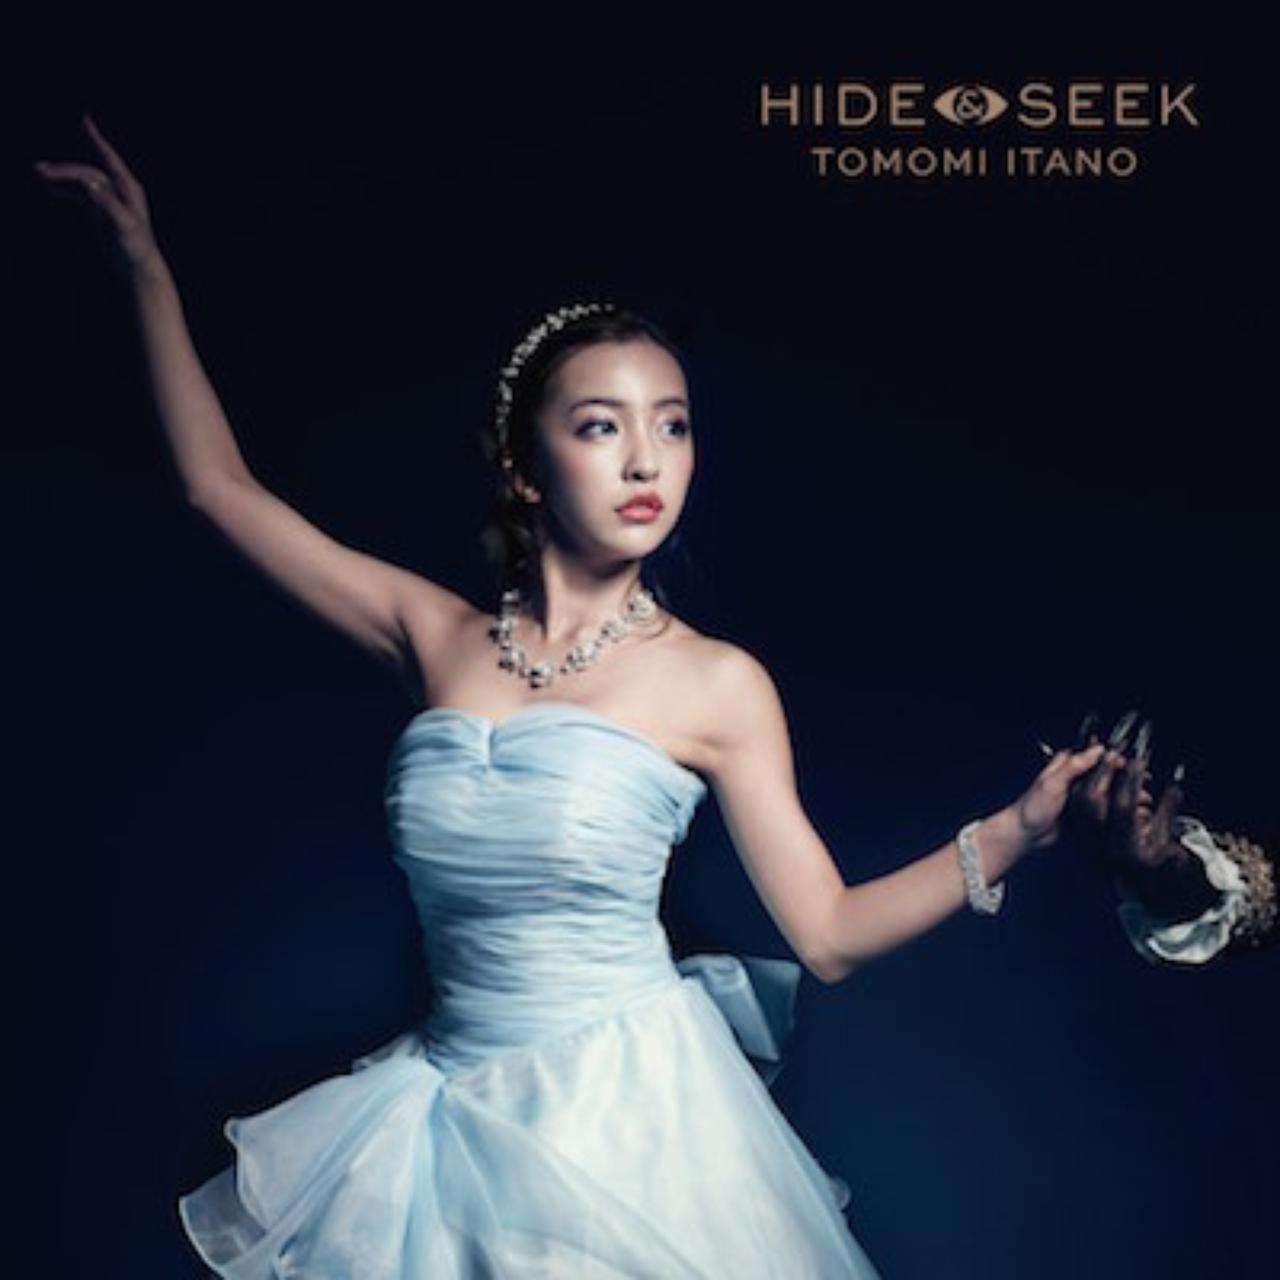 8th Single「HIDE & SEEK」 - 板野友美(Tomomi Itano)オフィシャルサイト